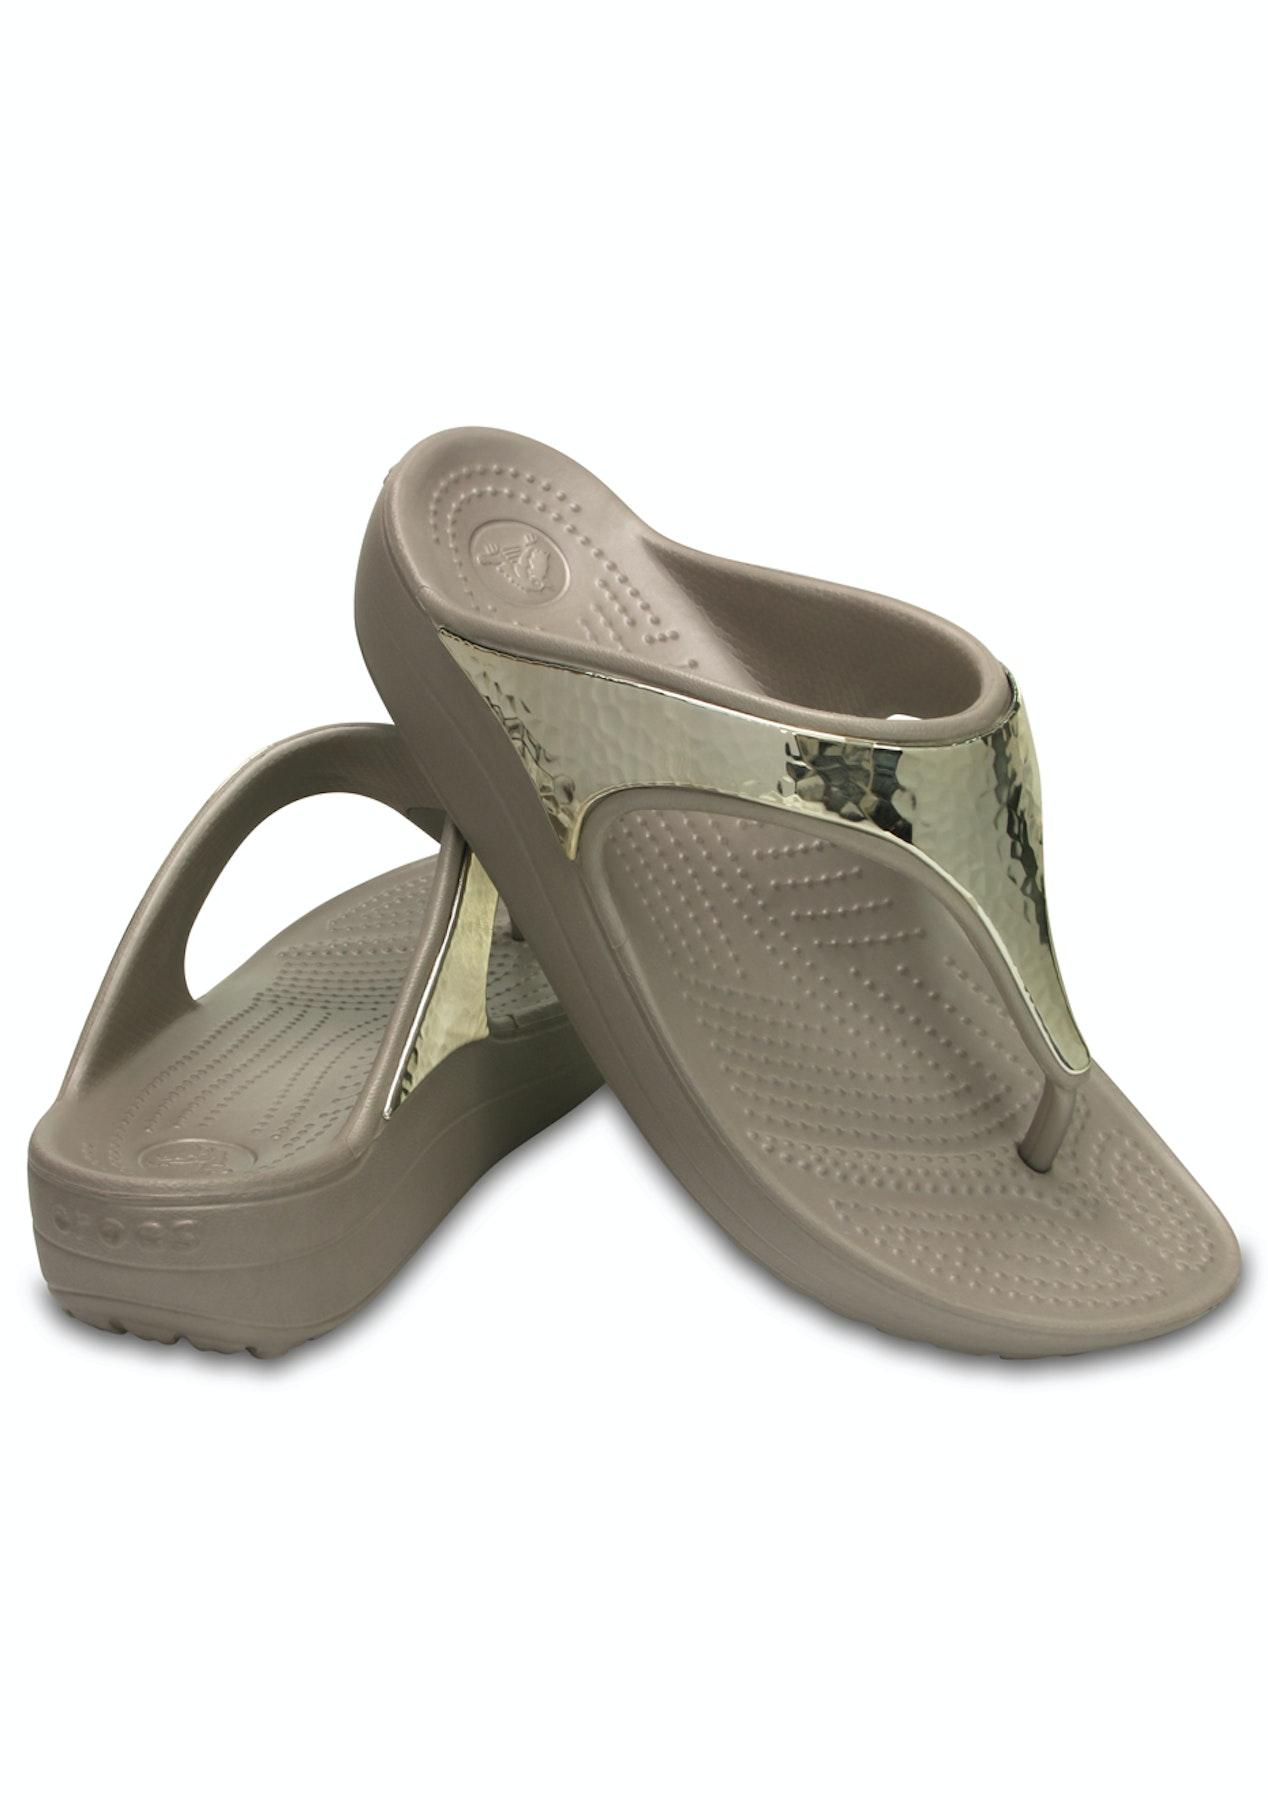 8531c14c39d9 CROCS - Womens Crocs Sloane Embellished Flip - Platinum - Crocs - Onceit